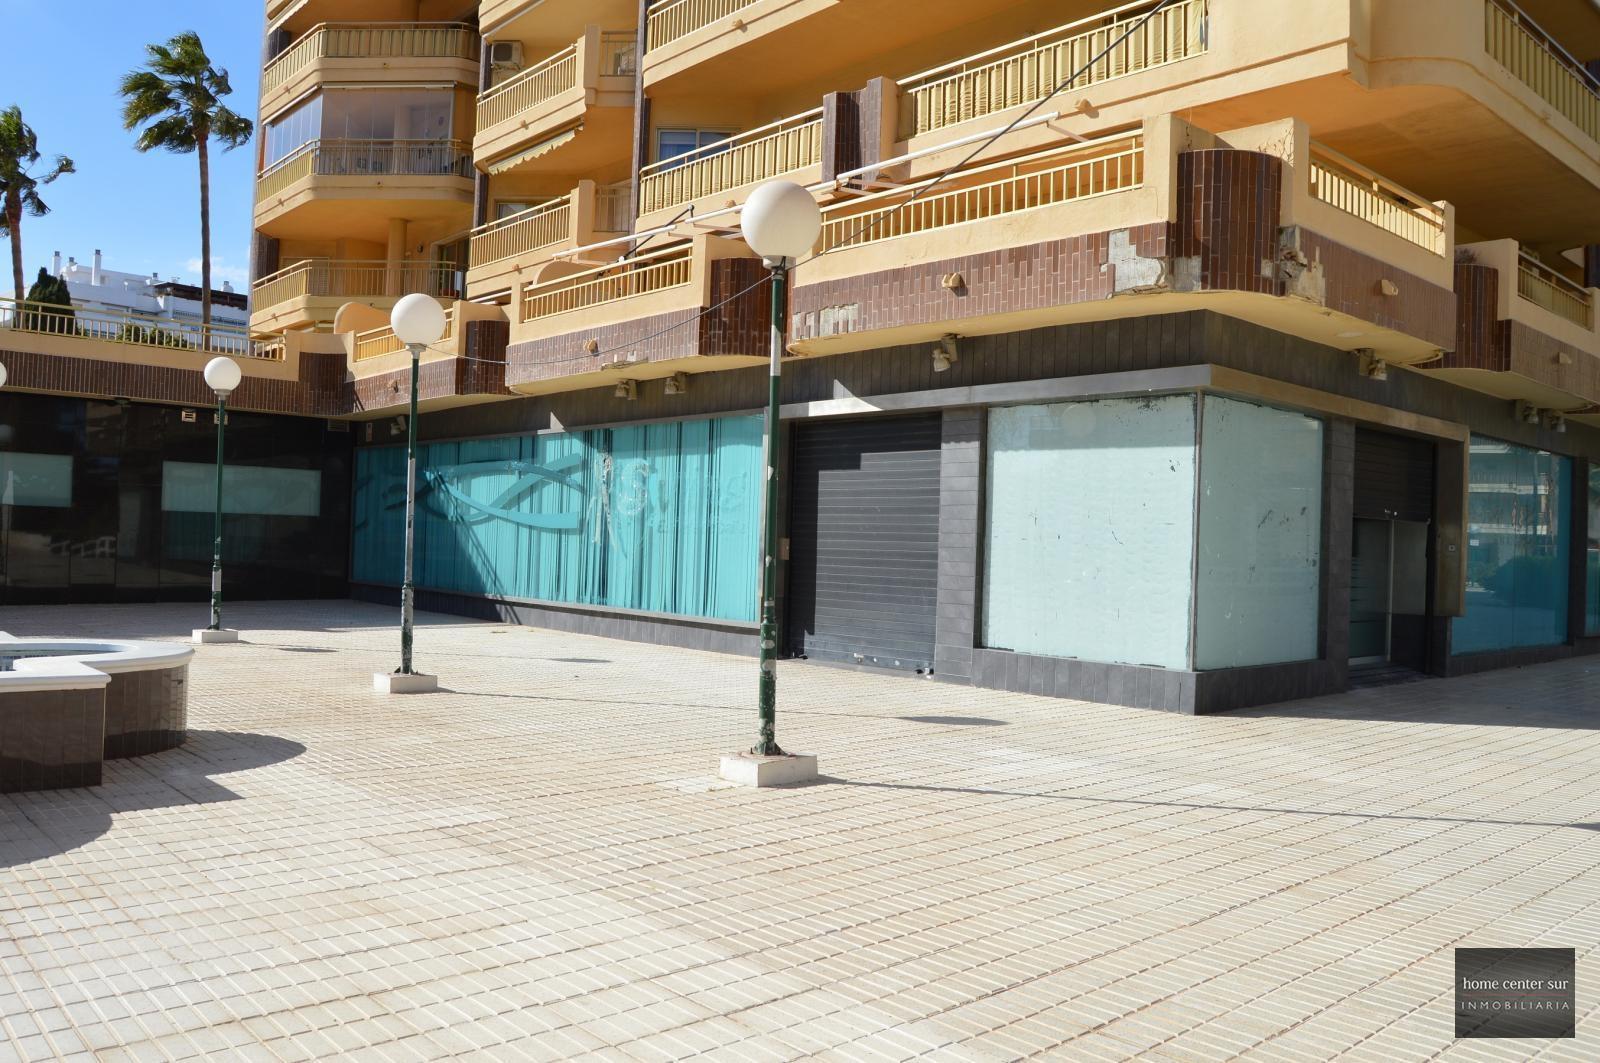 Local en alquiler en Avenida Santa Amalia (Fuengirola), 3.600 €/mes